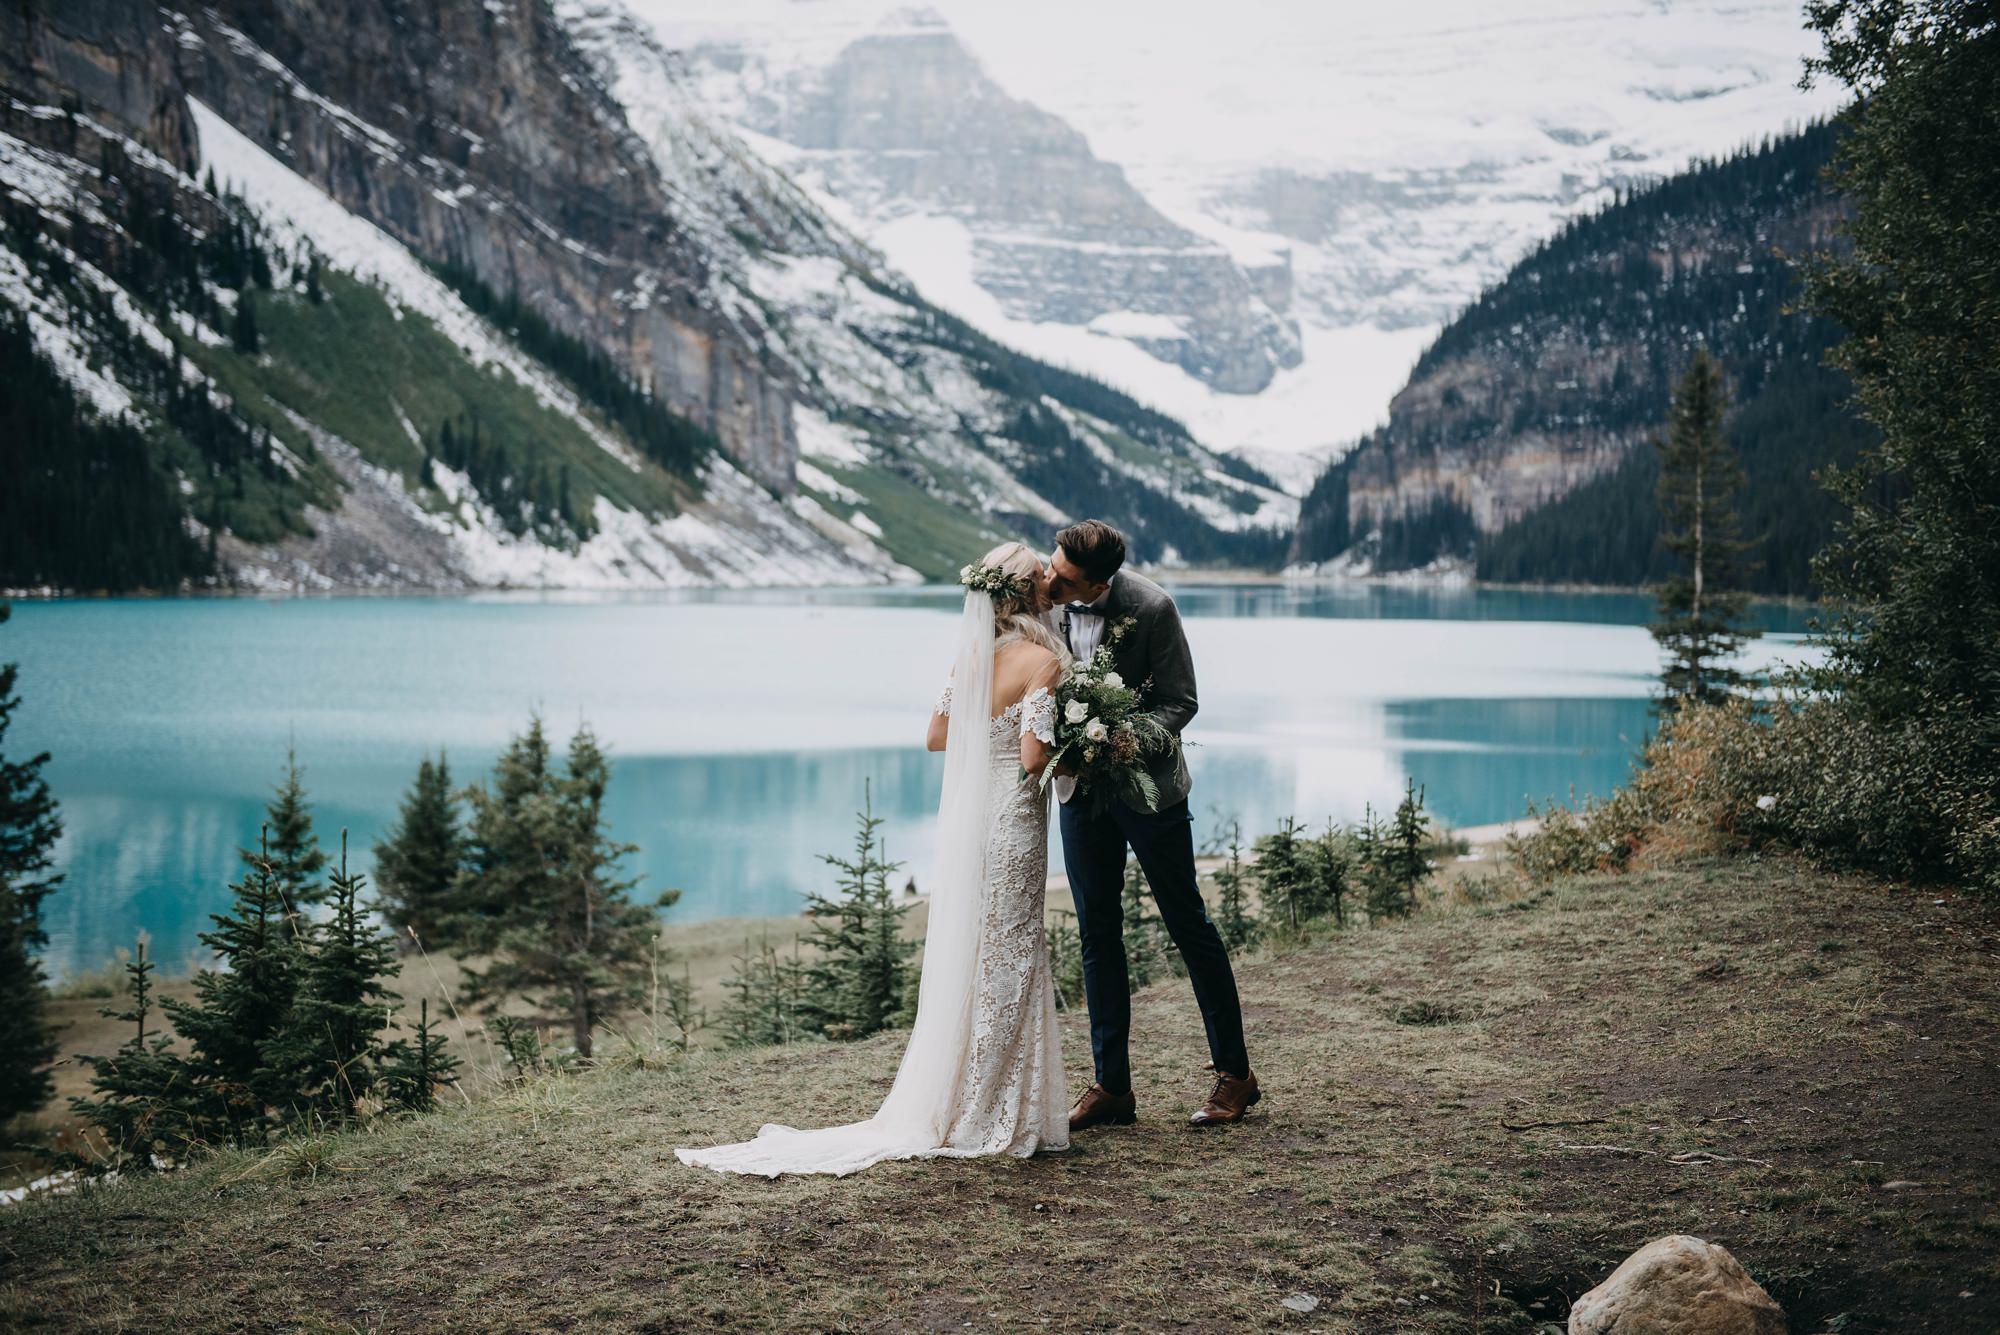 Intimate boho wedding captured at Lake Louise elopement at banff national park